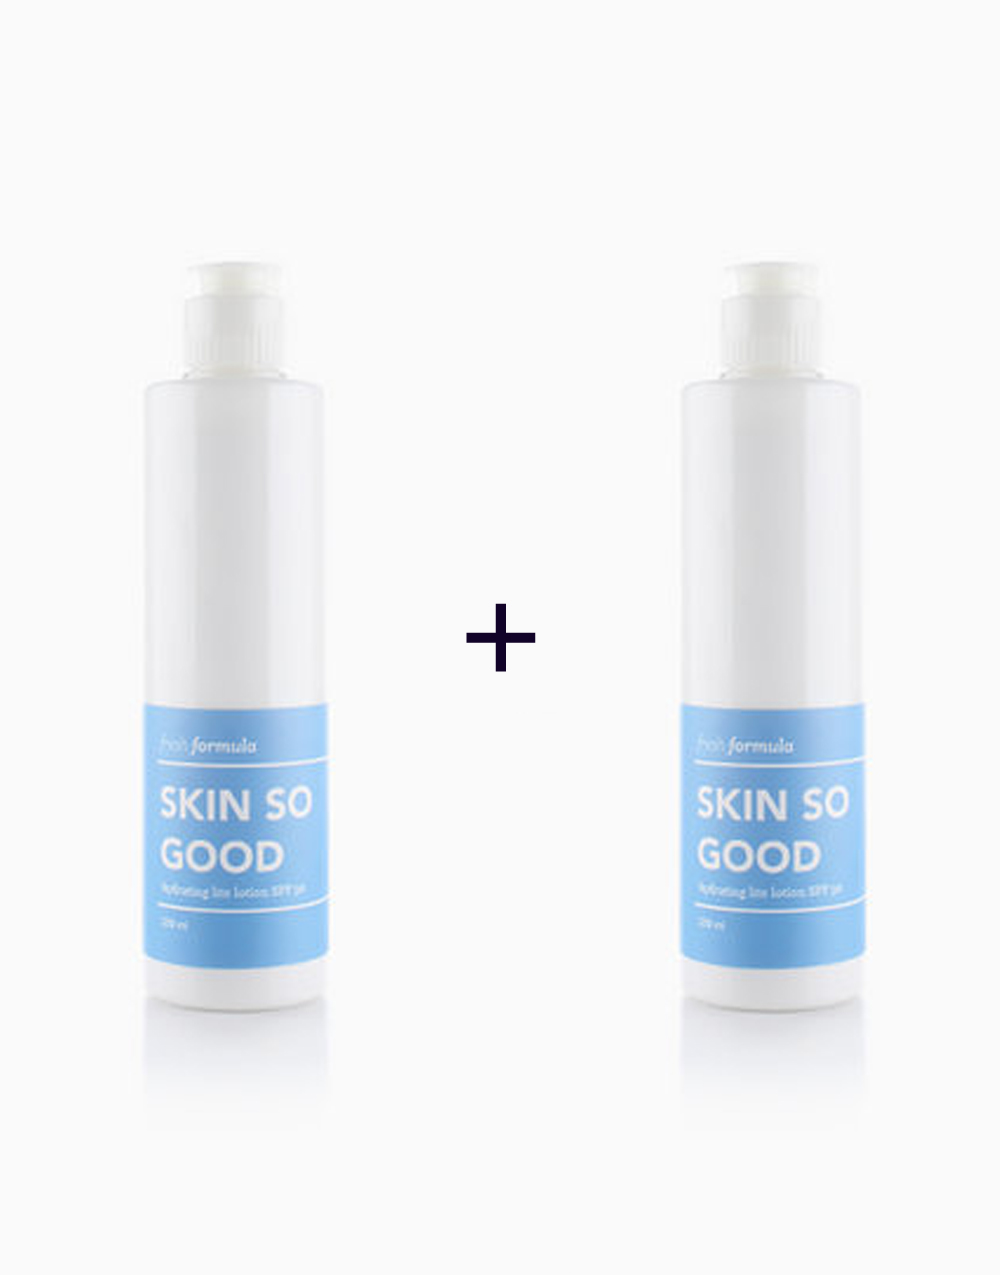 Skin So Good Hydrating Lite Lotion SPF 30 (Buy 1, Take 1) by Fresh Formula